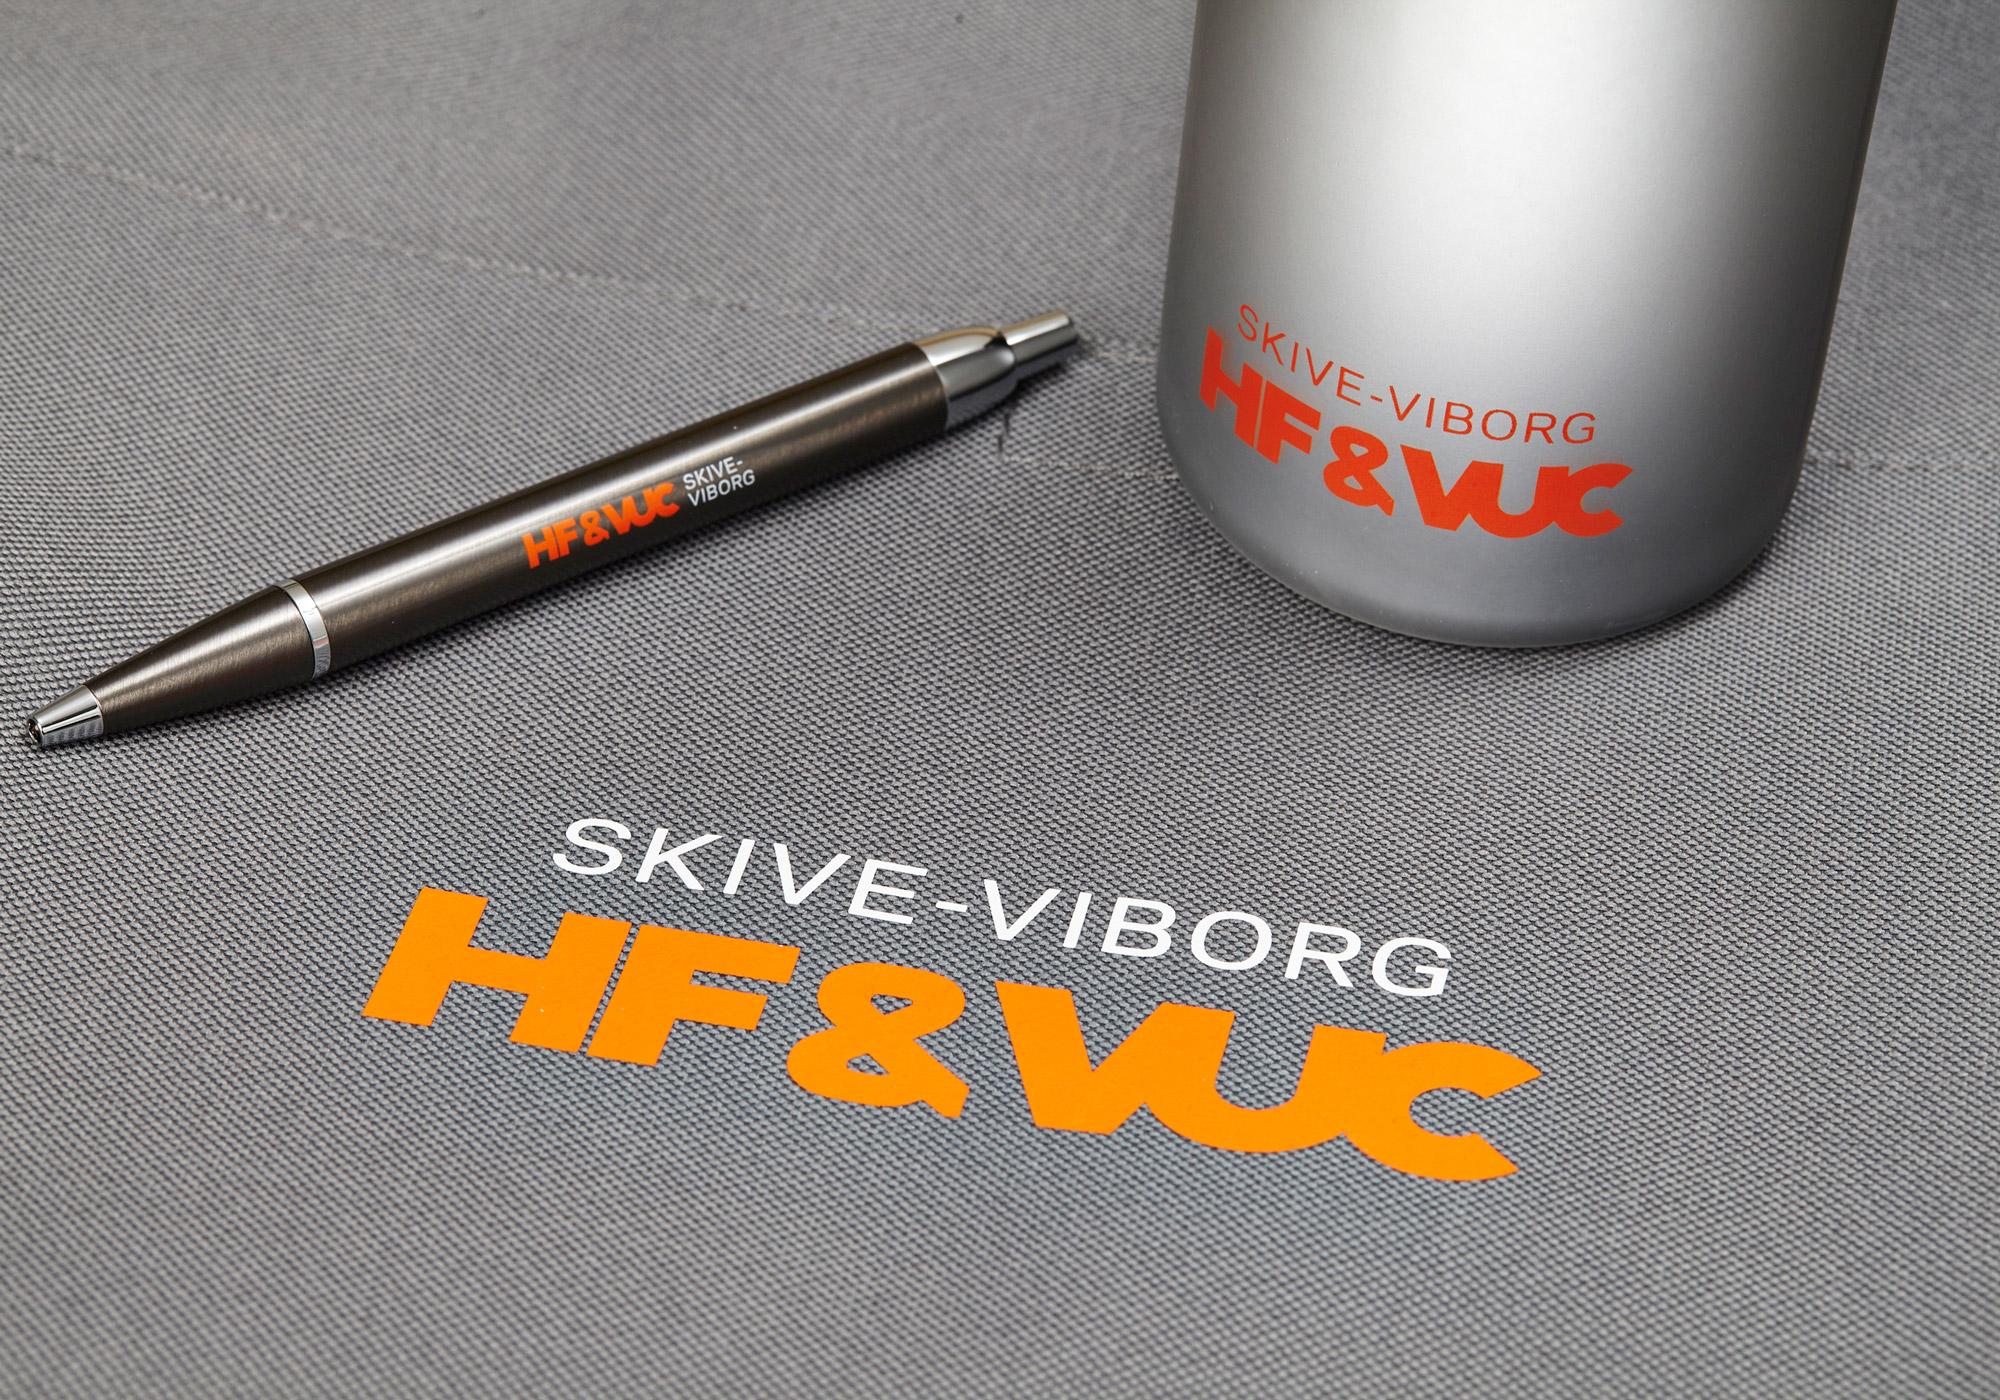 Skive-Viborg-merch.jpg